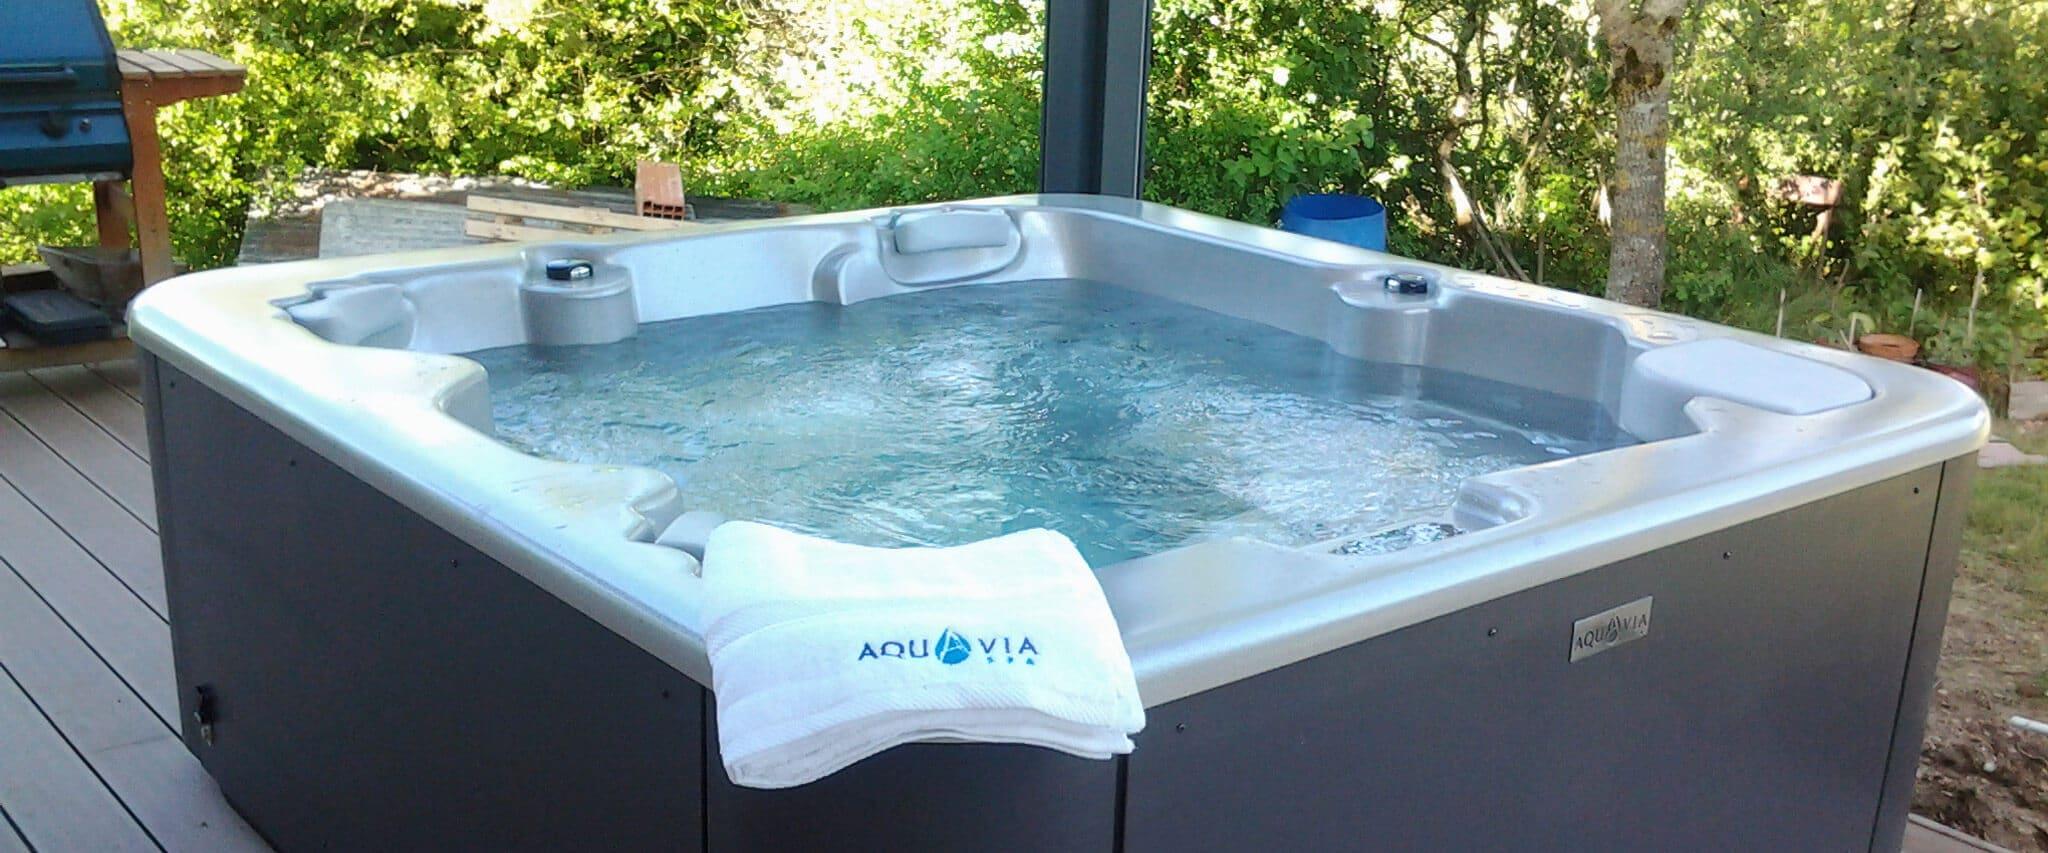 Buy the easy access hot tub Aqualife 5 - Aquavia Spa UK